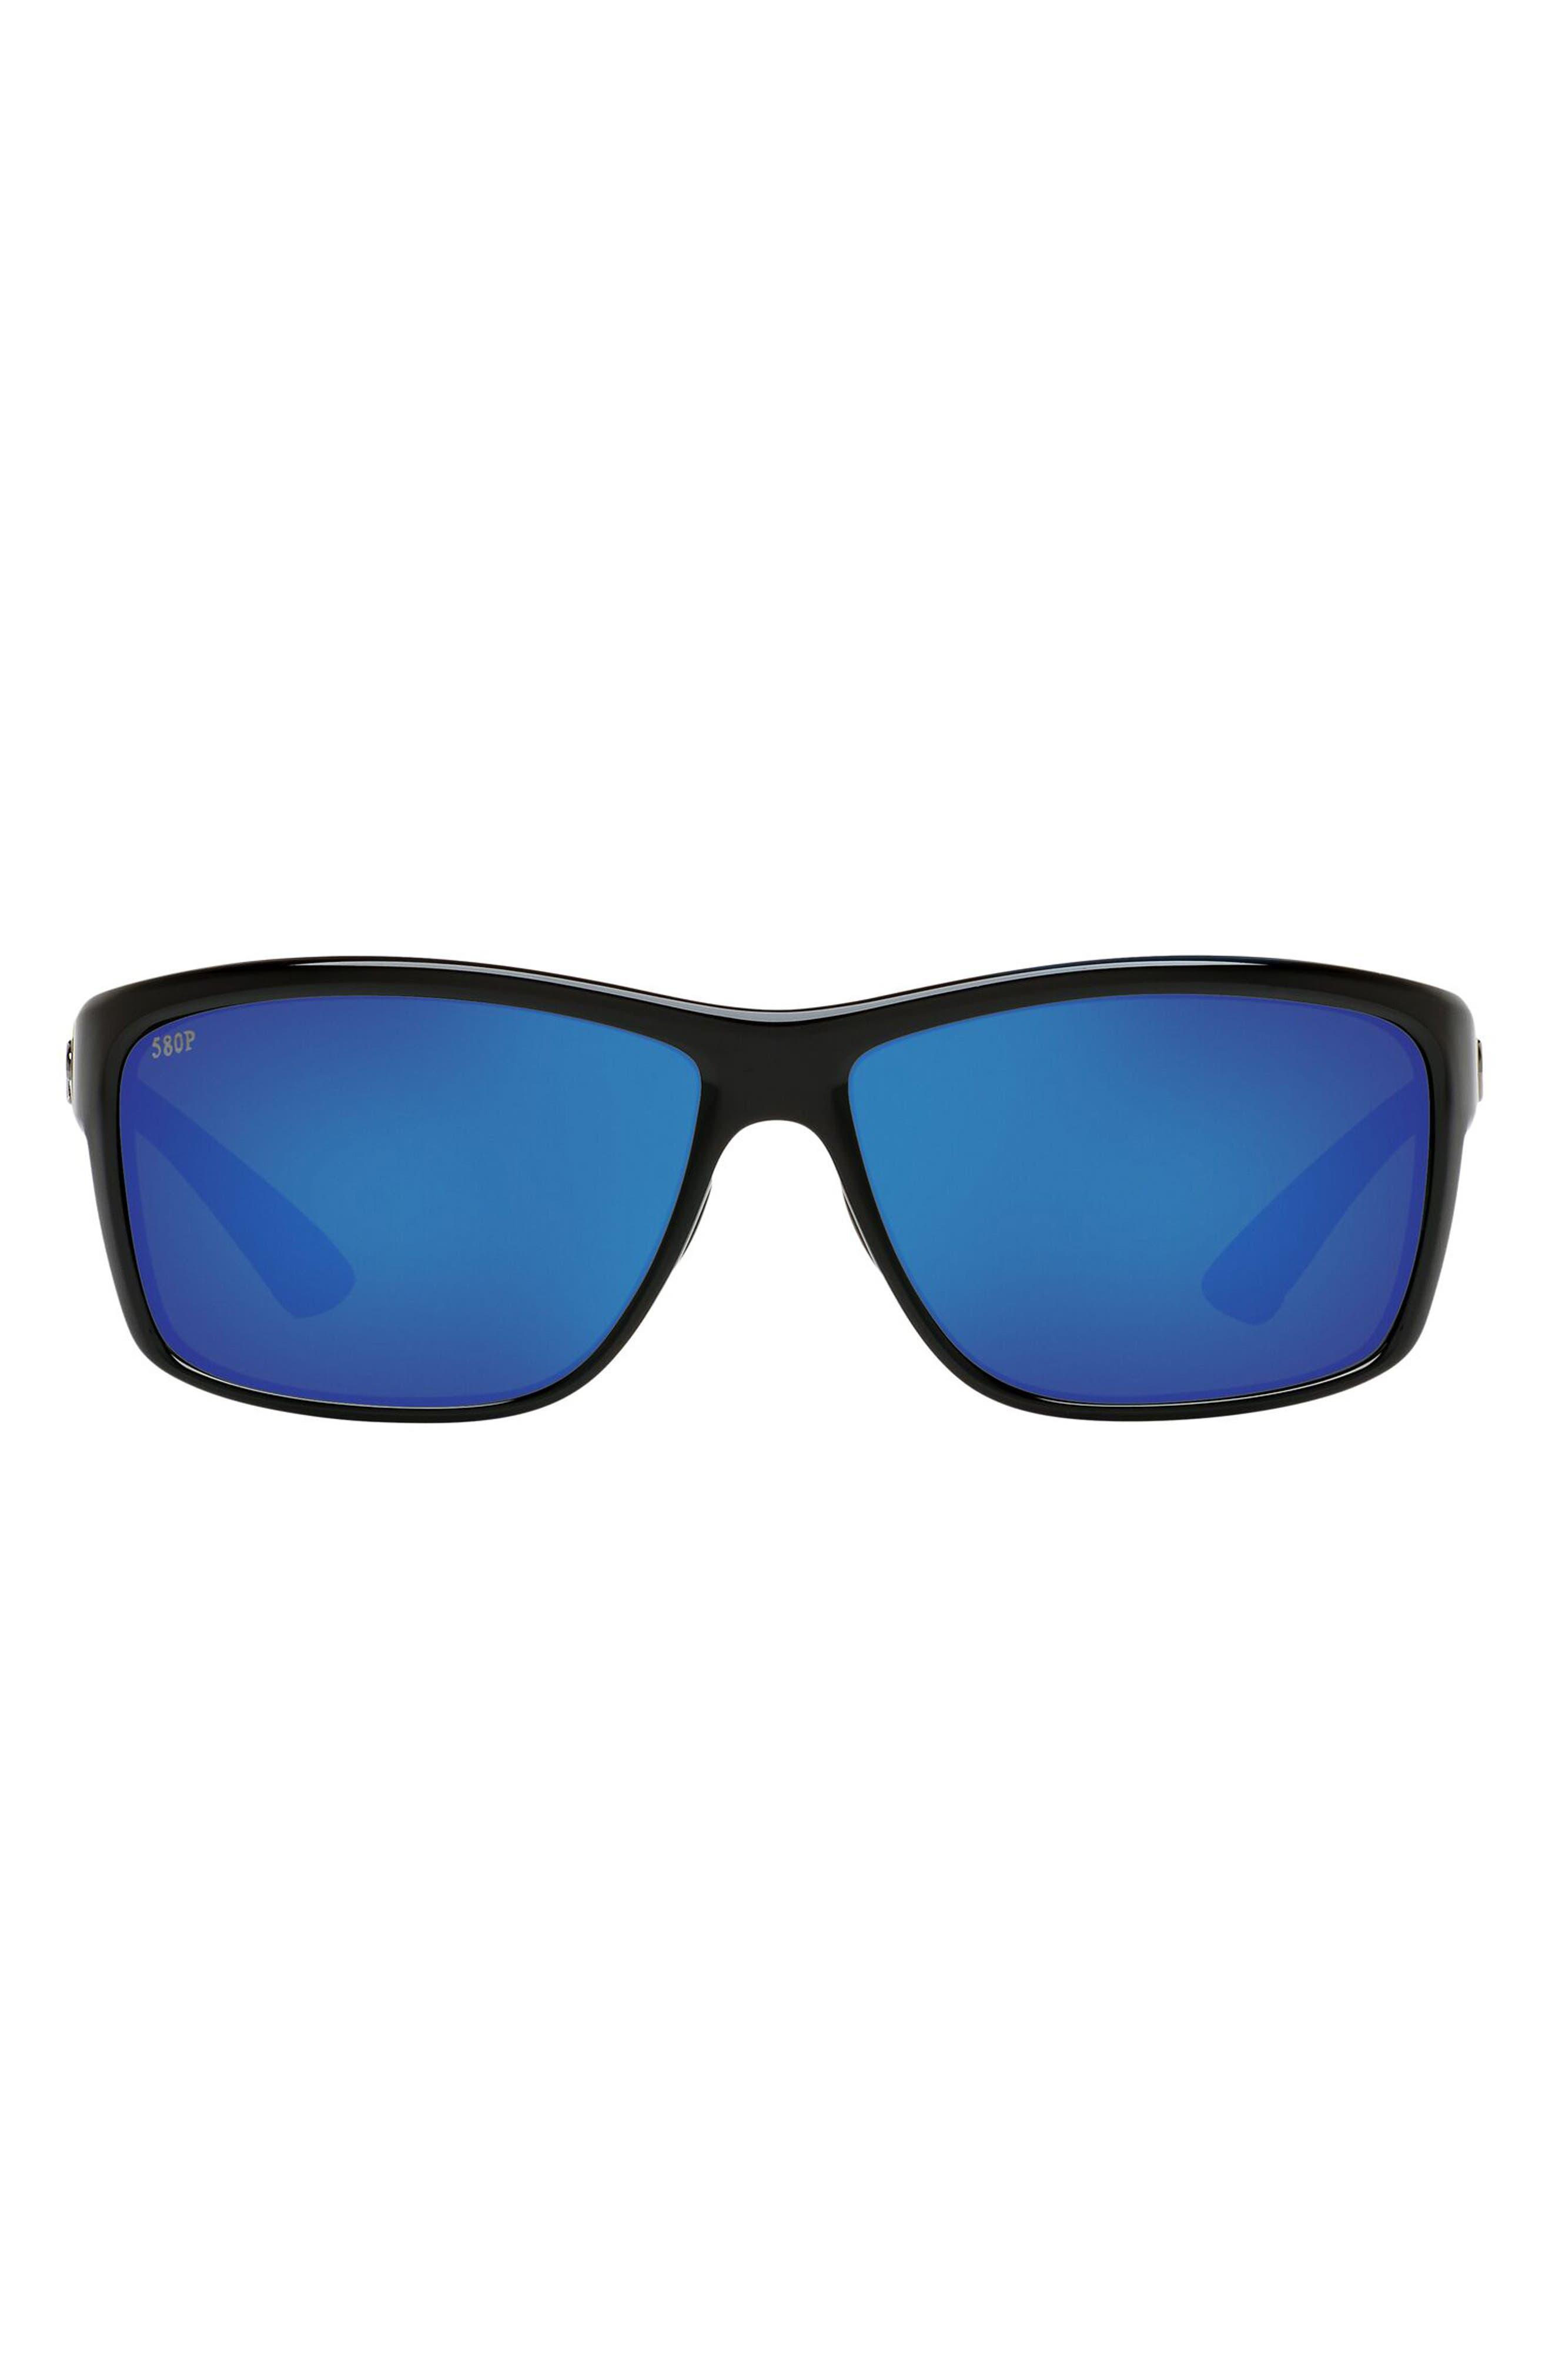 63mm Rectangle Sunglasses